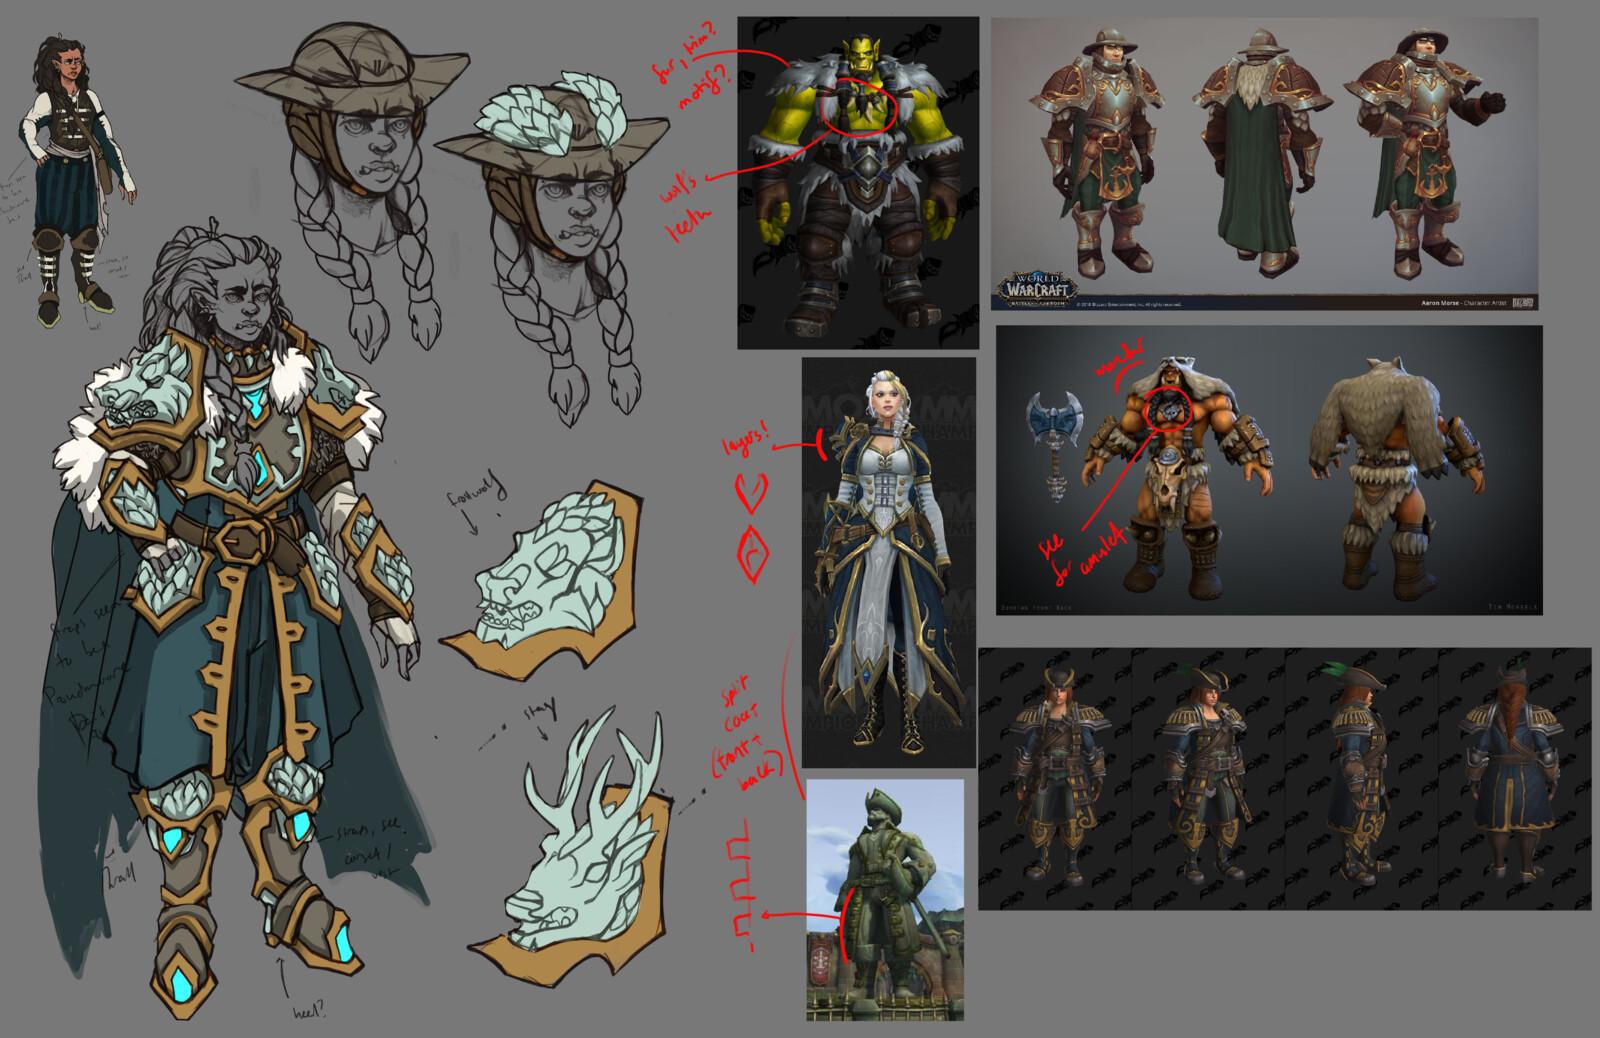 World of Warcraft: Thrall/Jaina child fan concept